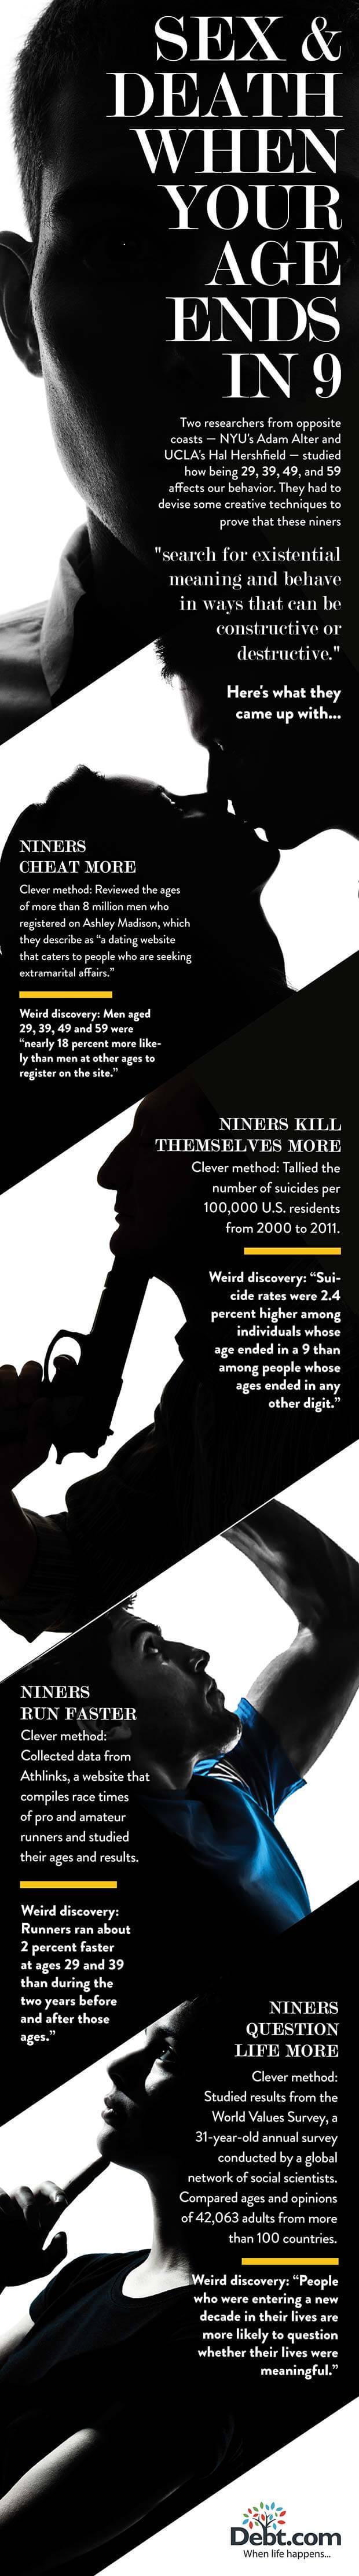 niners_opt